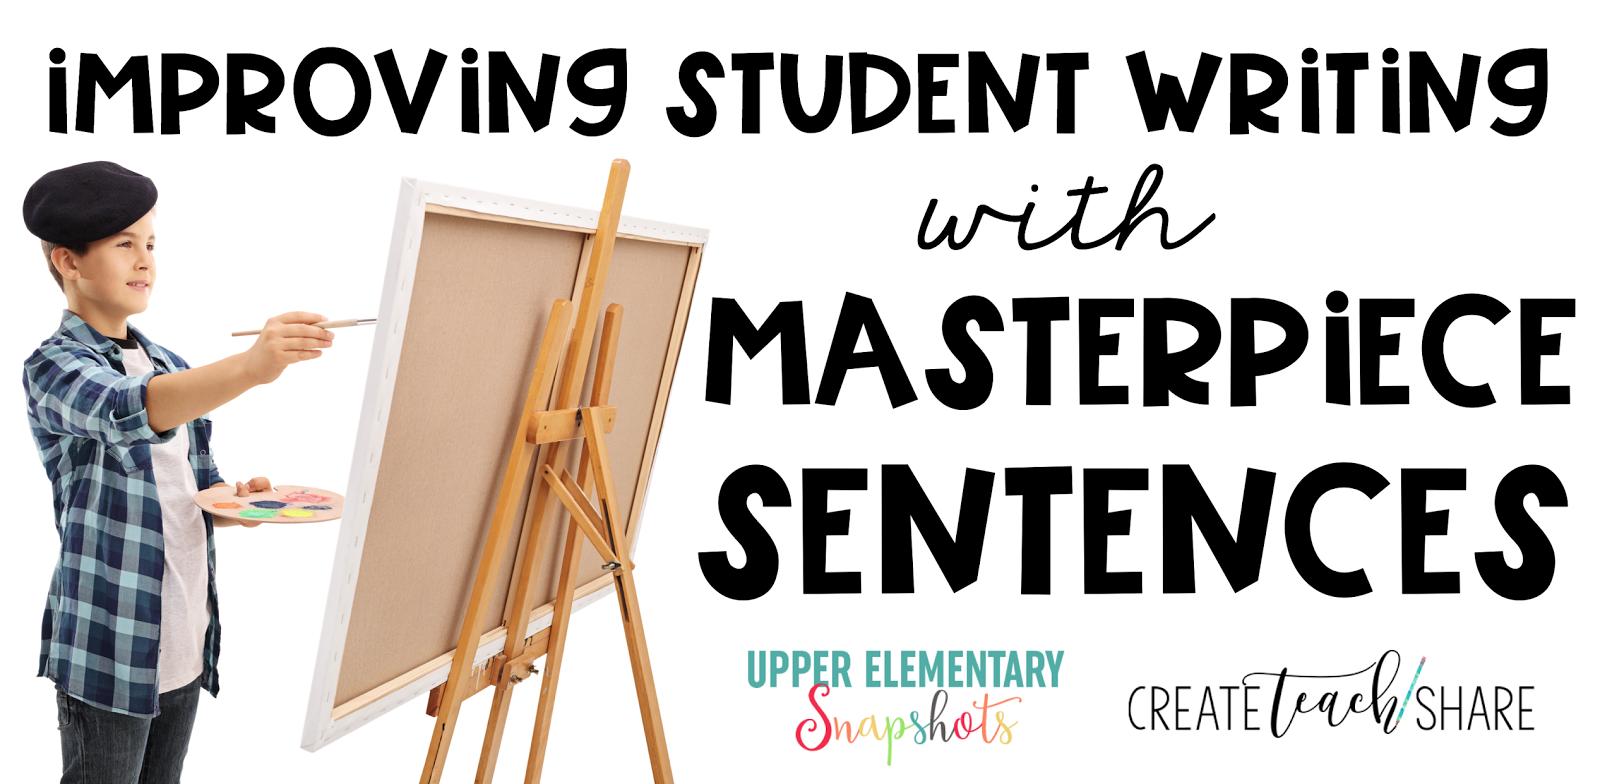 Upper Elementary Snapshots Improving Student Writing